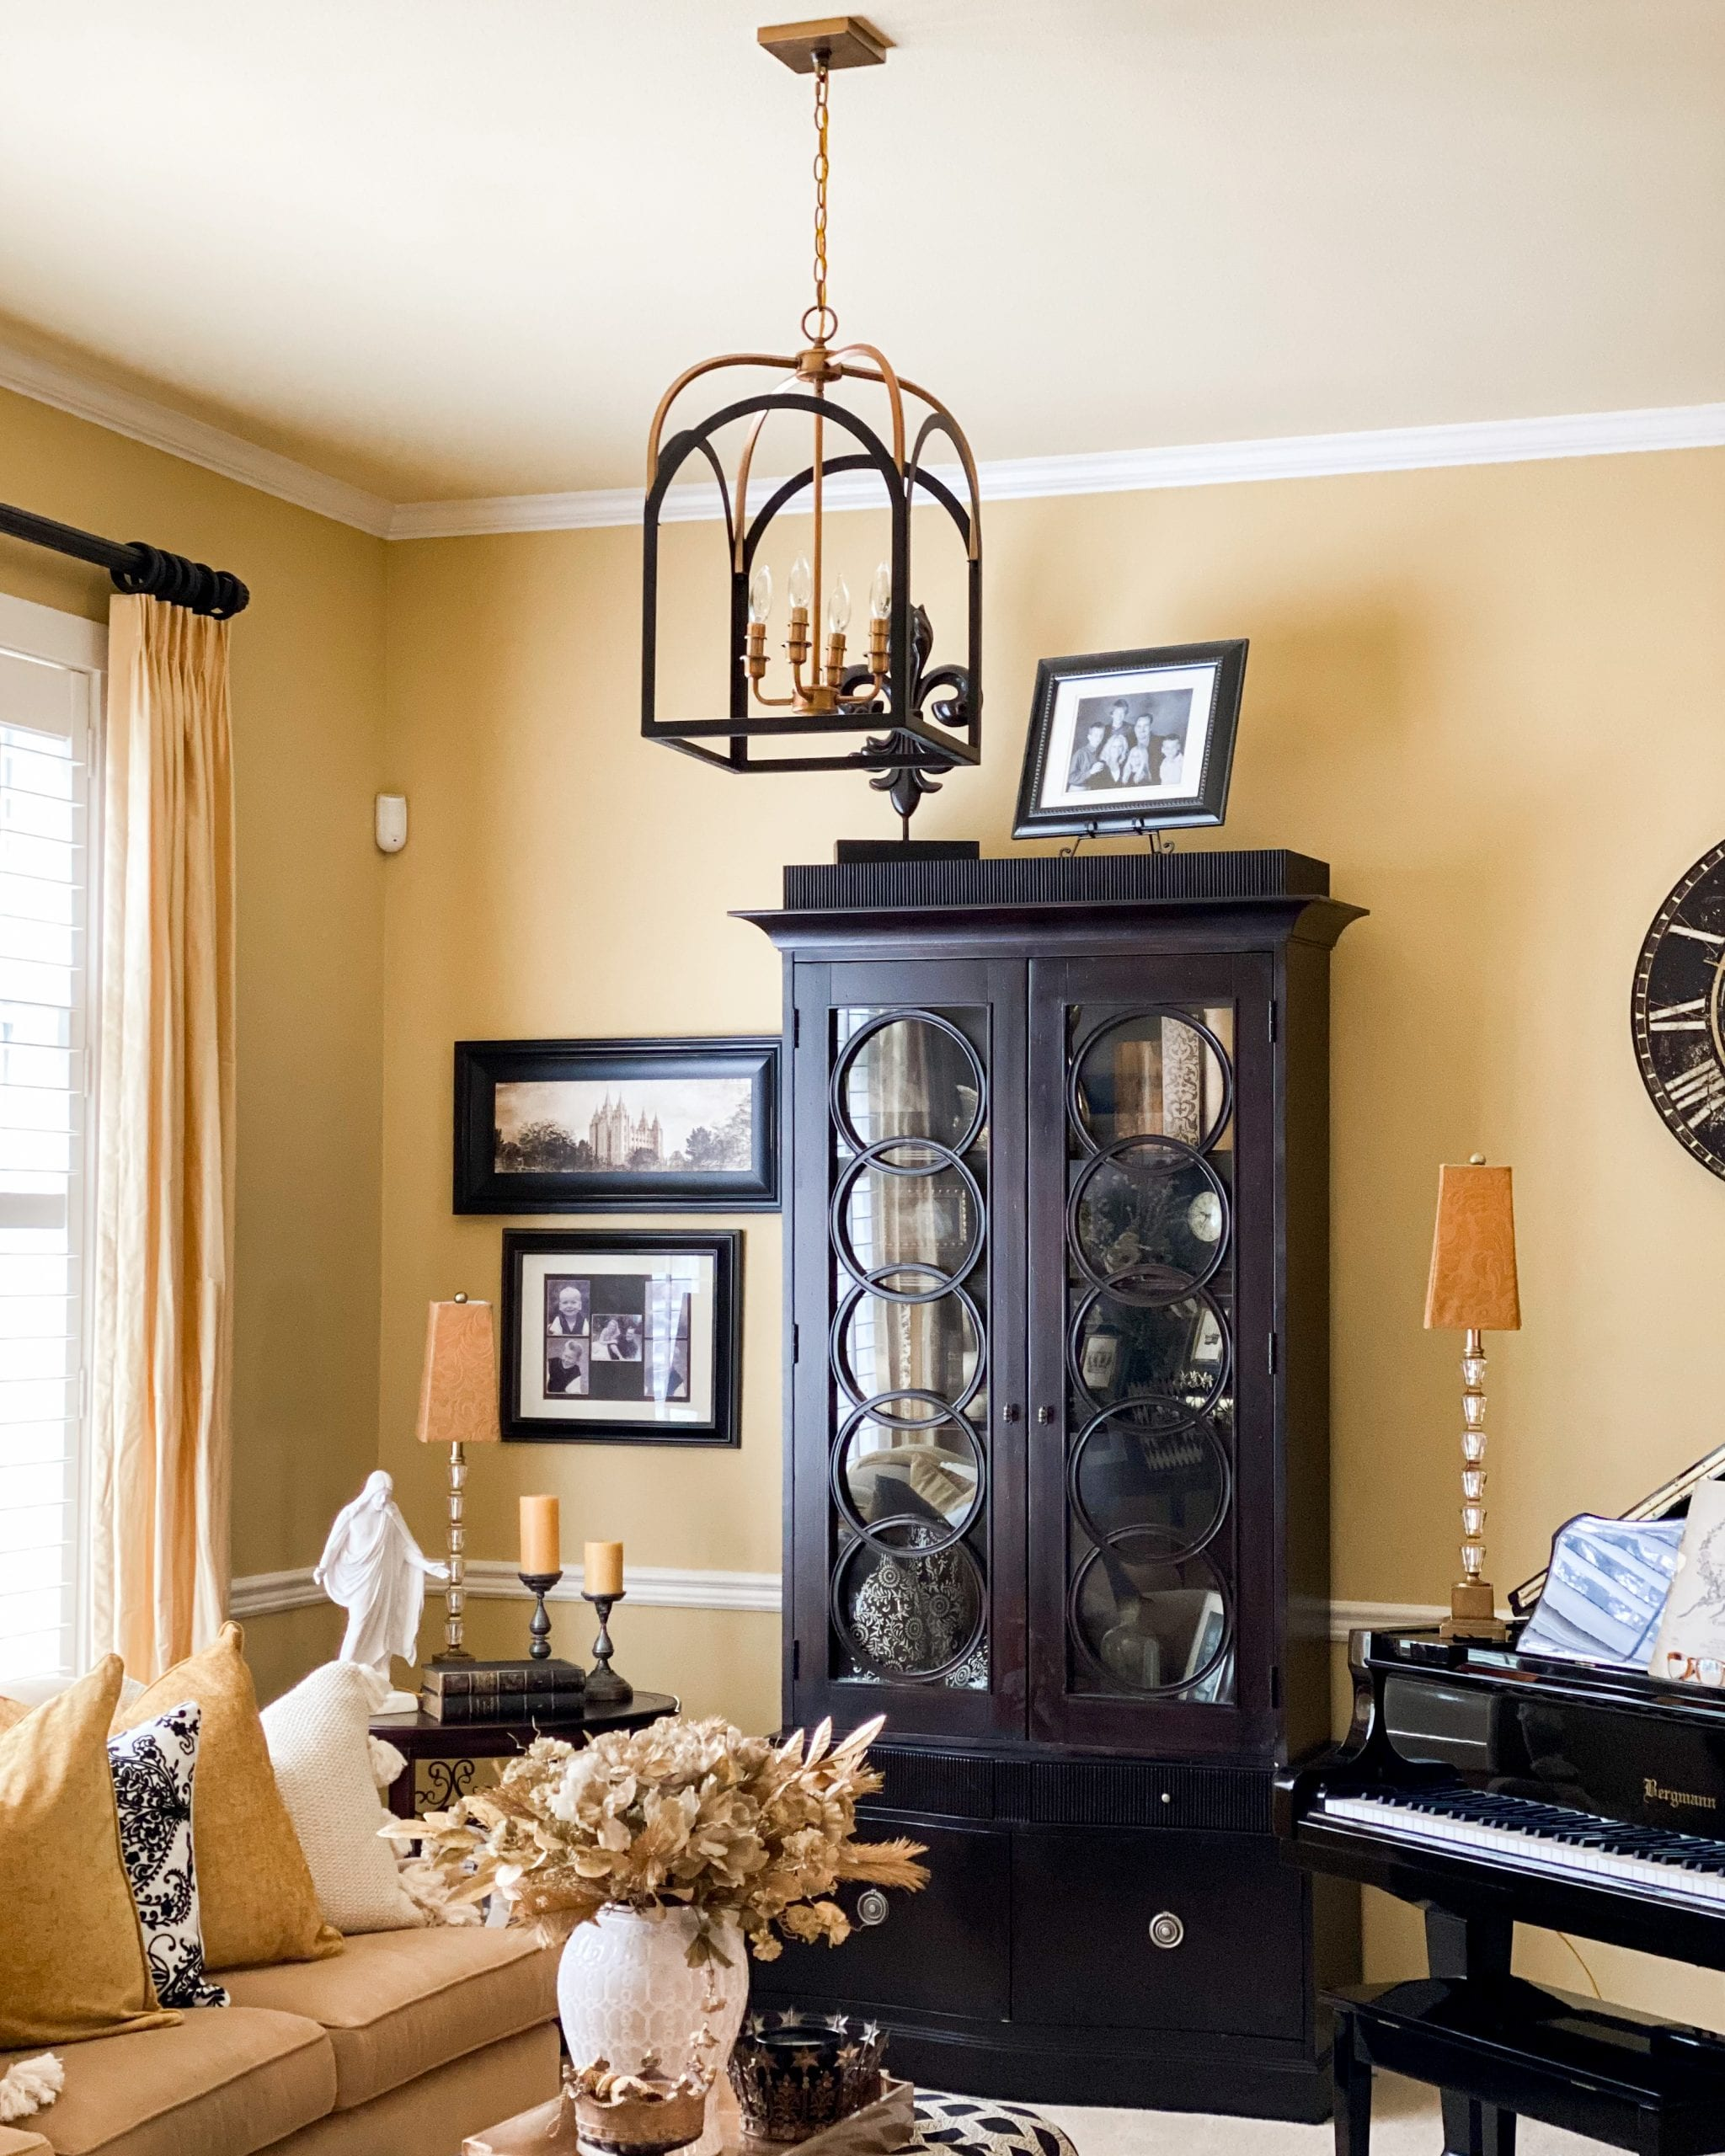 park harbor henrico pendant lighting, Updating Lights In Your Home